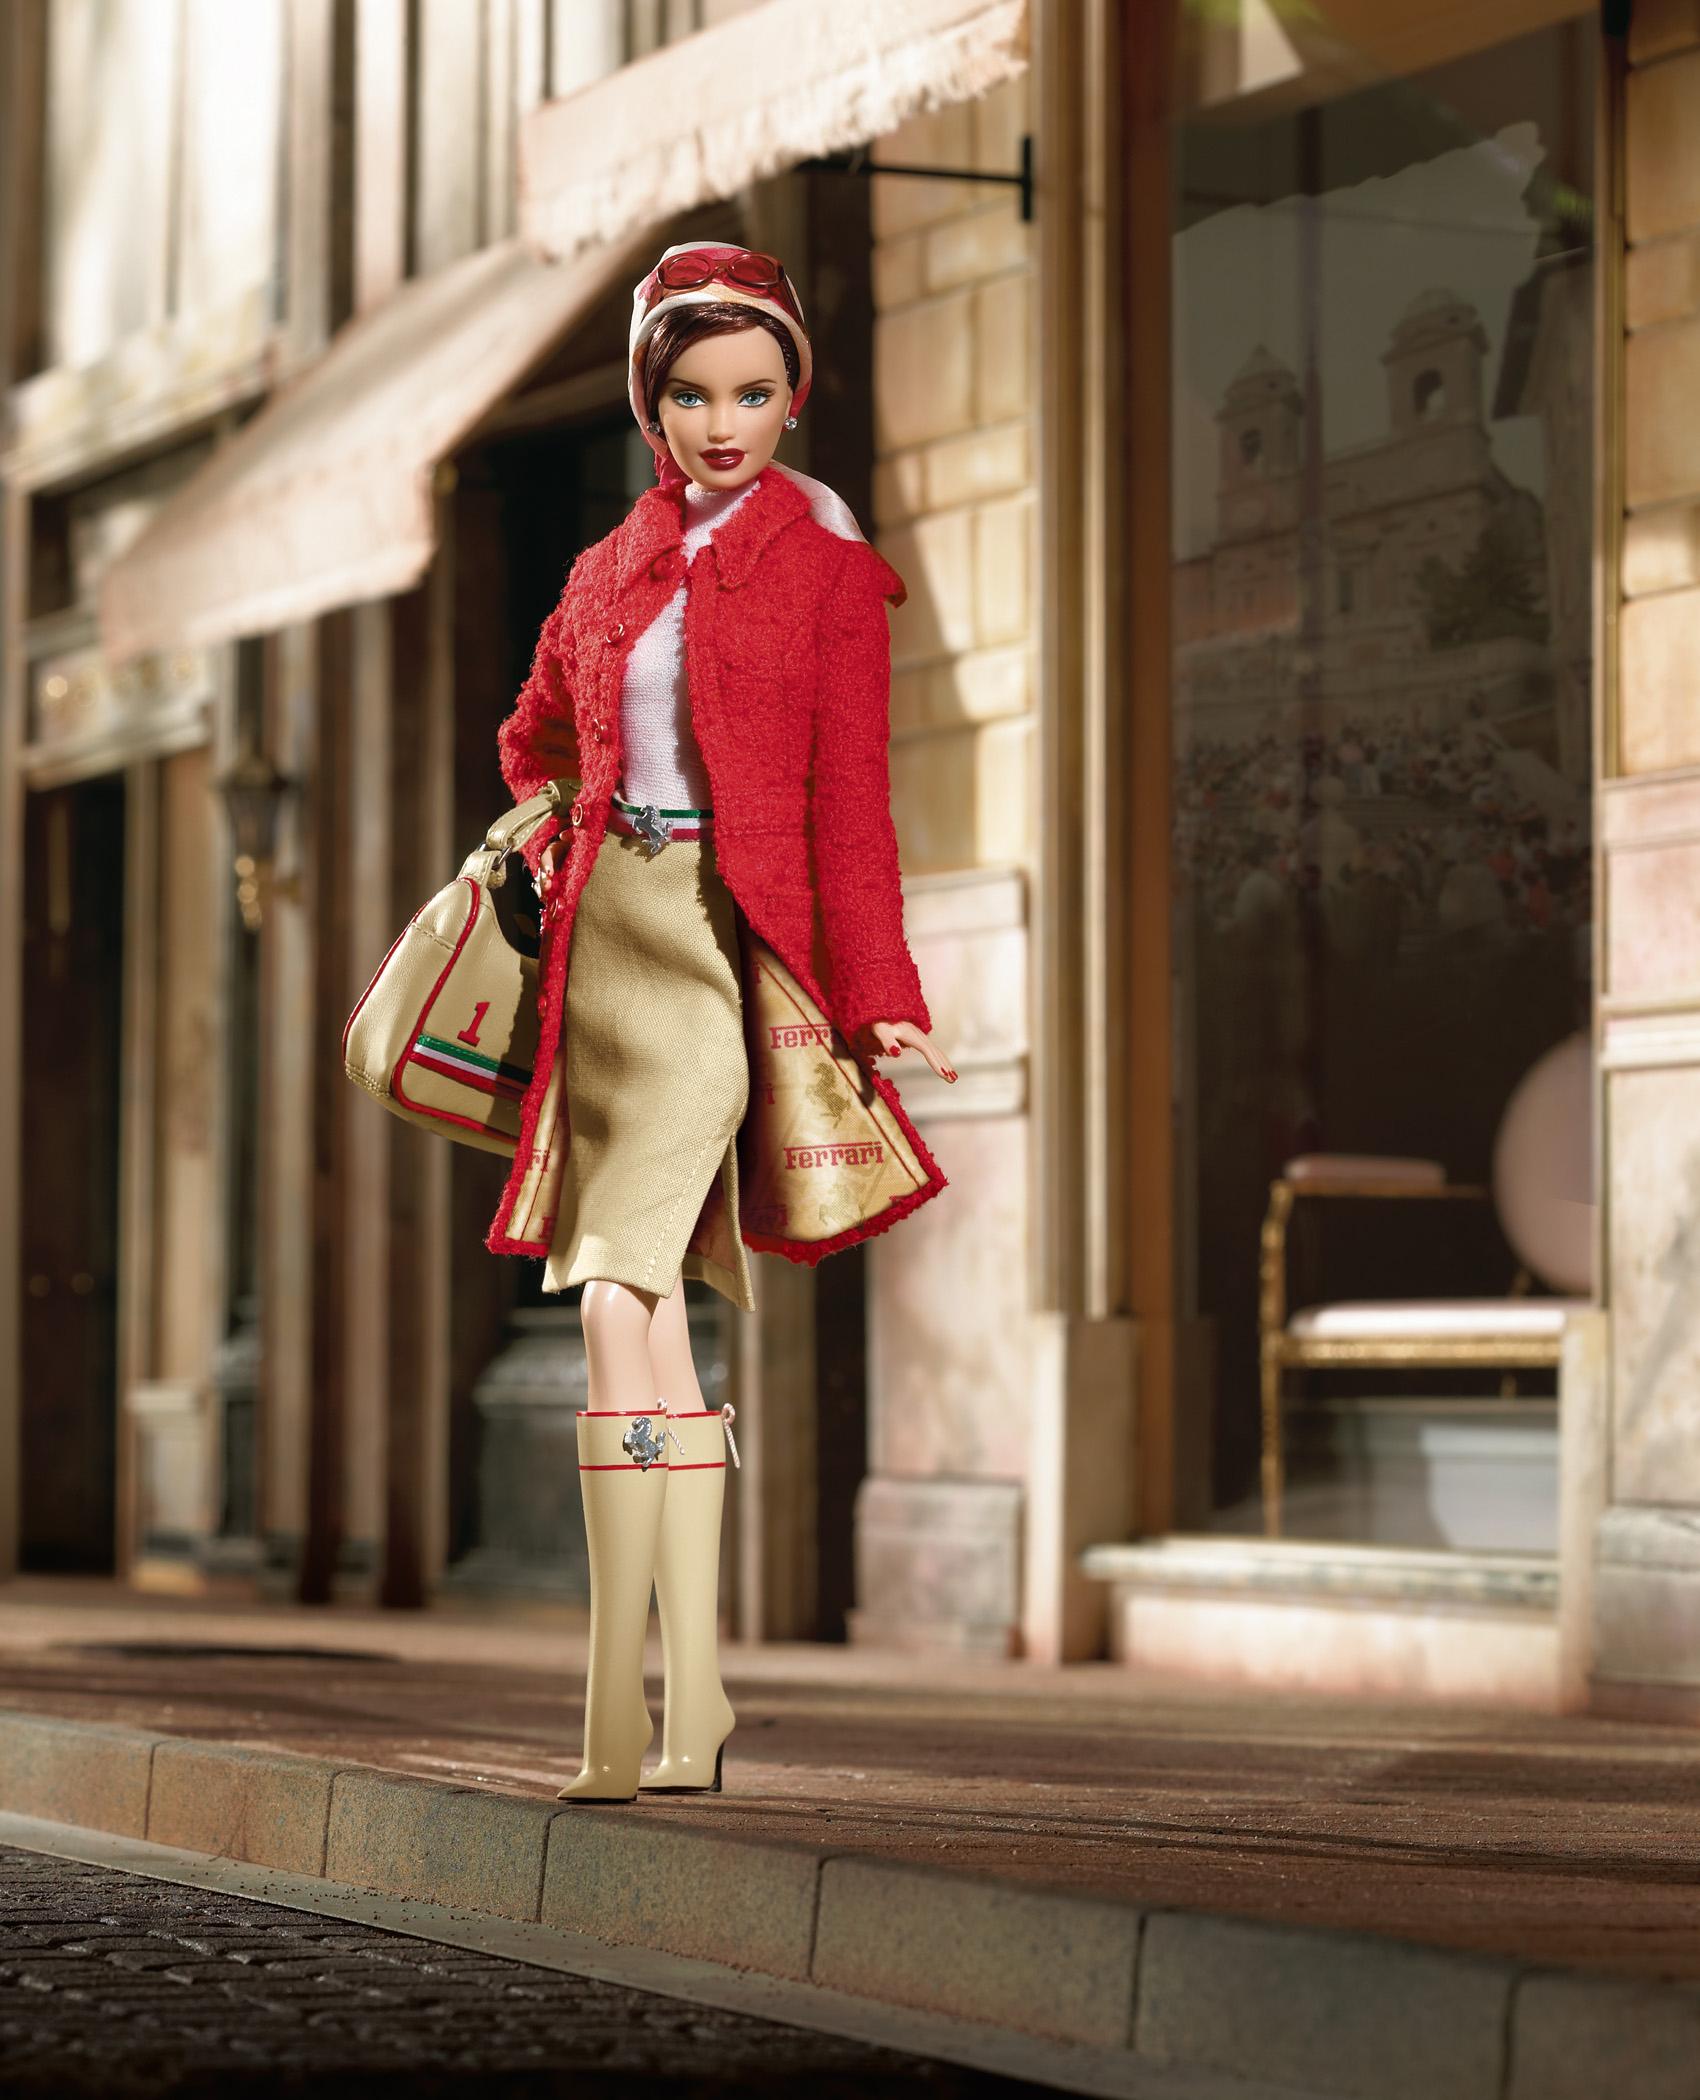 The Ferrari Barbie Doll, released in 2005.